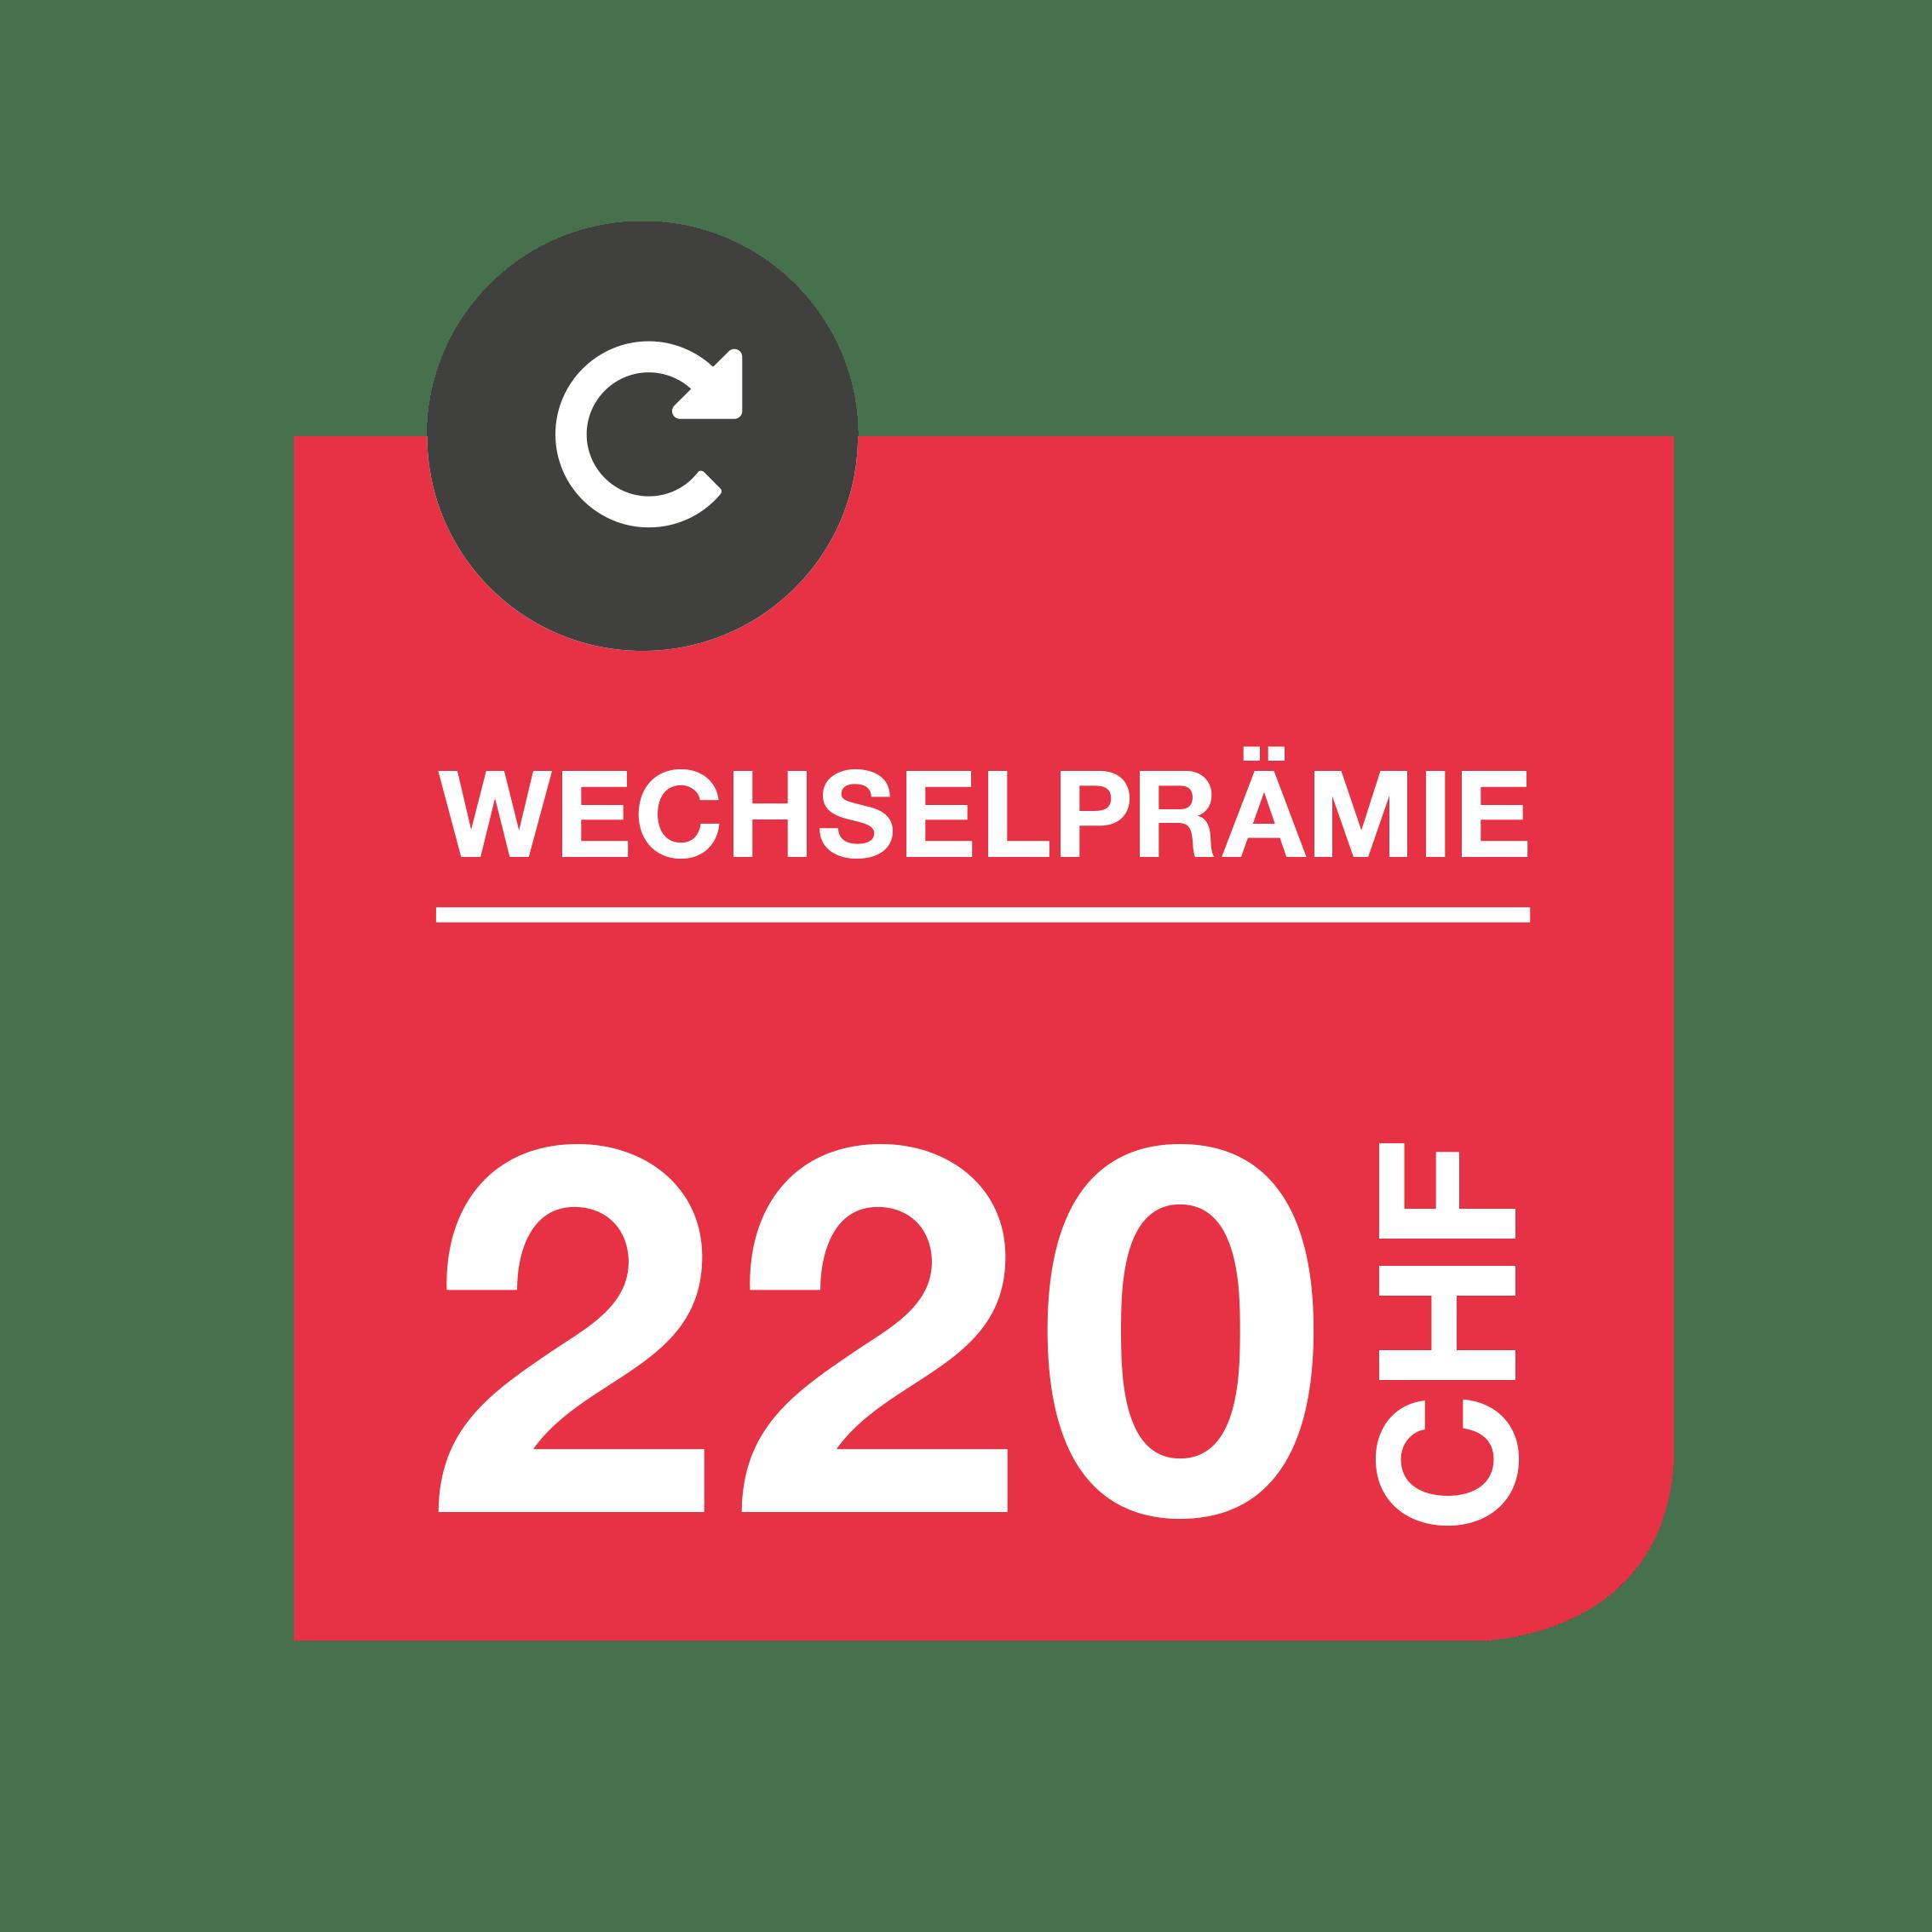 Wechselpraemie_220CHF_DE